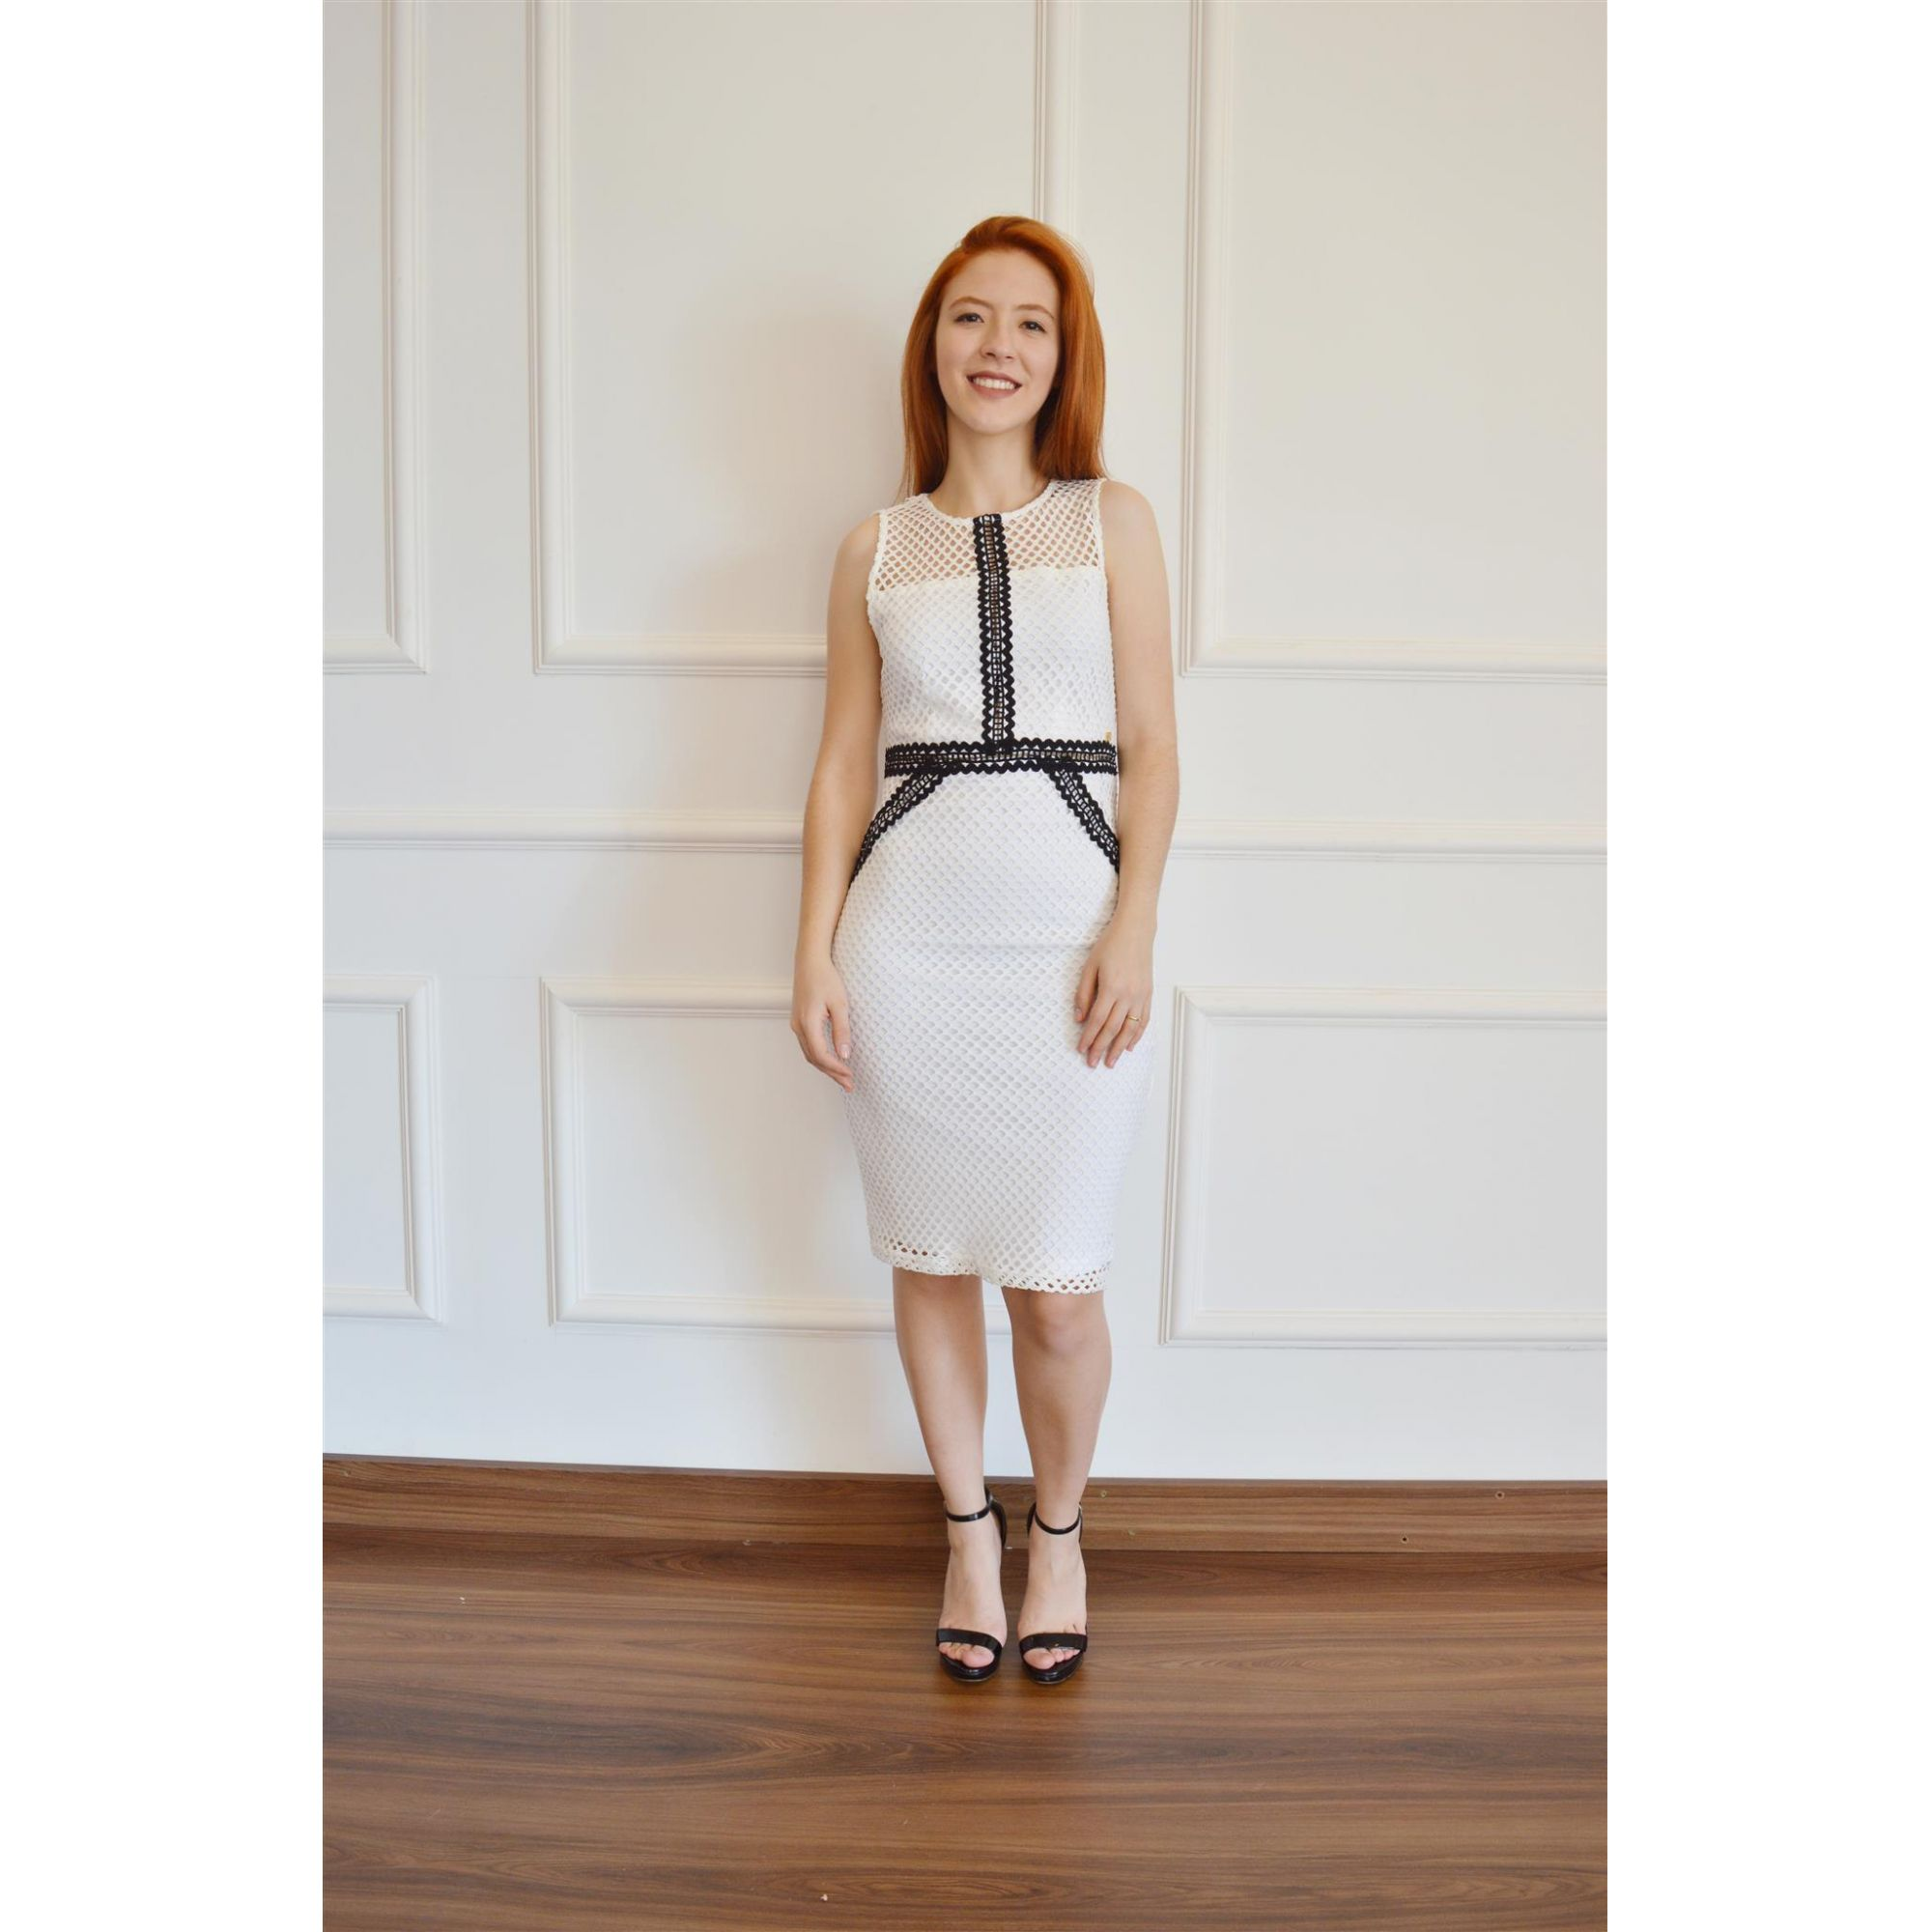 af3c2ff3a ... Vestido Feminino Tubinho Curto Branco Chris Santini ...